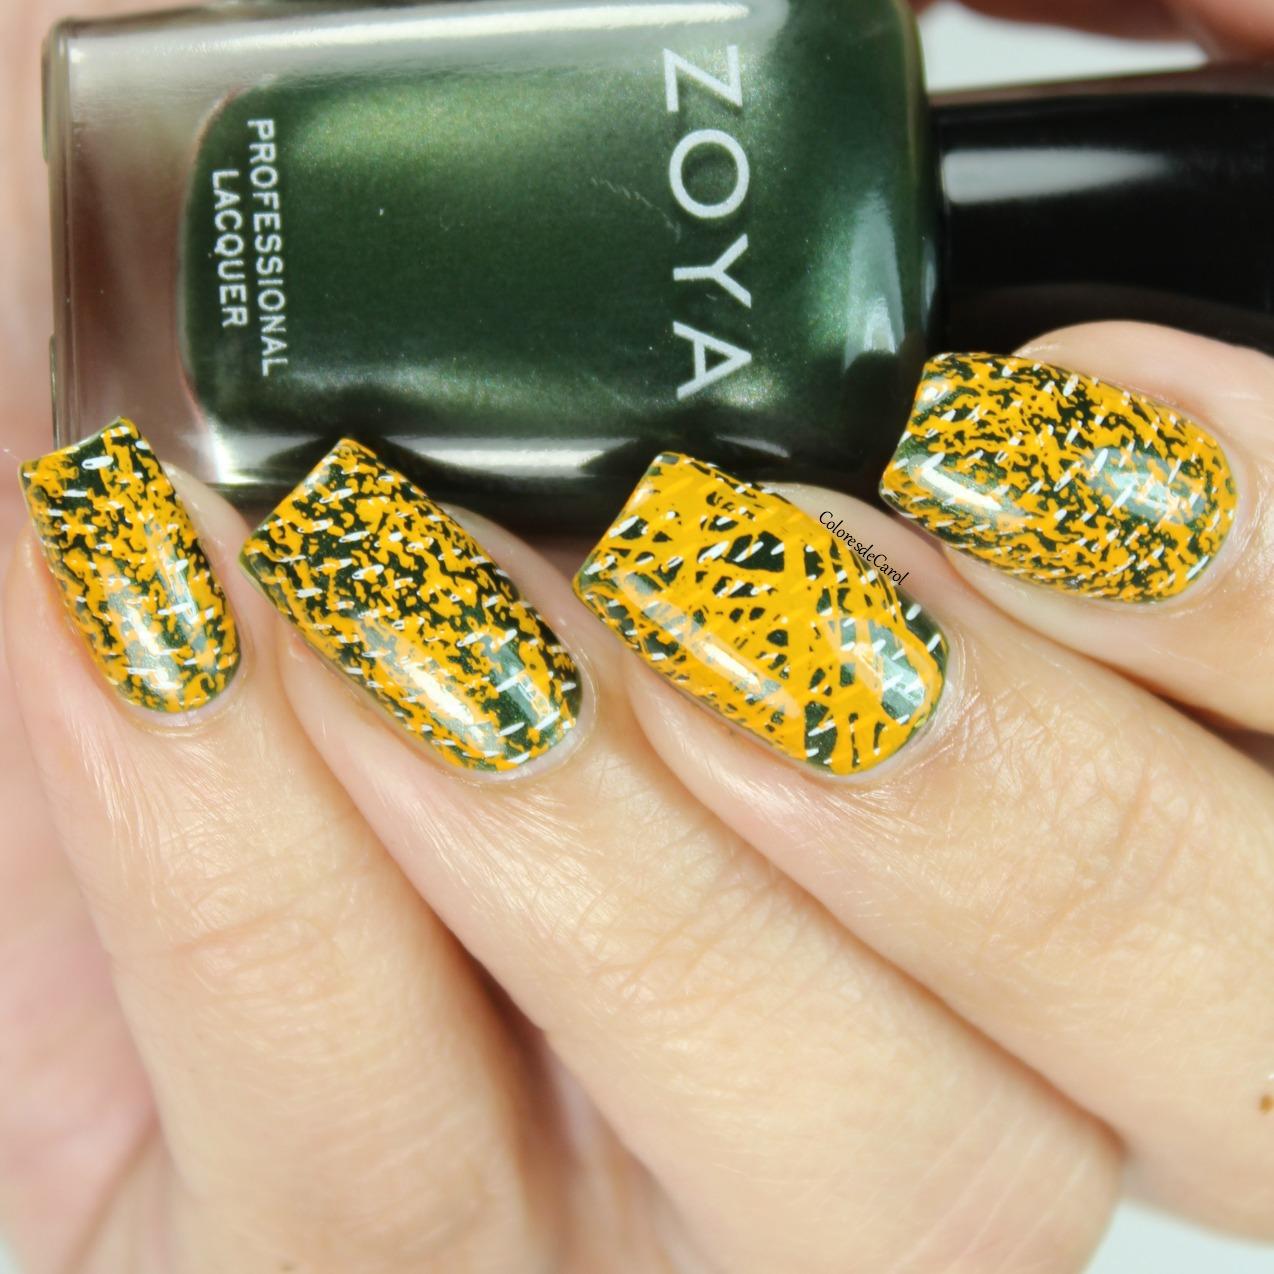 Colores de Carol: Texture-licious-03 - Uber Mini Nail Stamp Plate